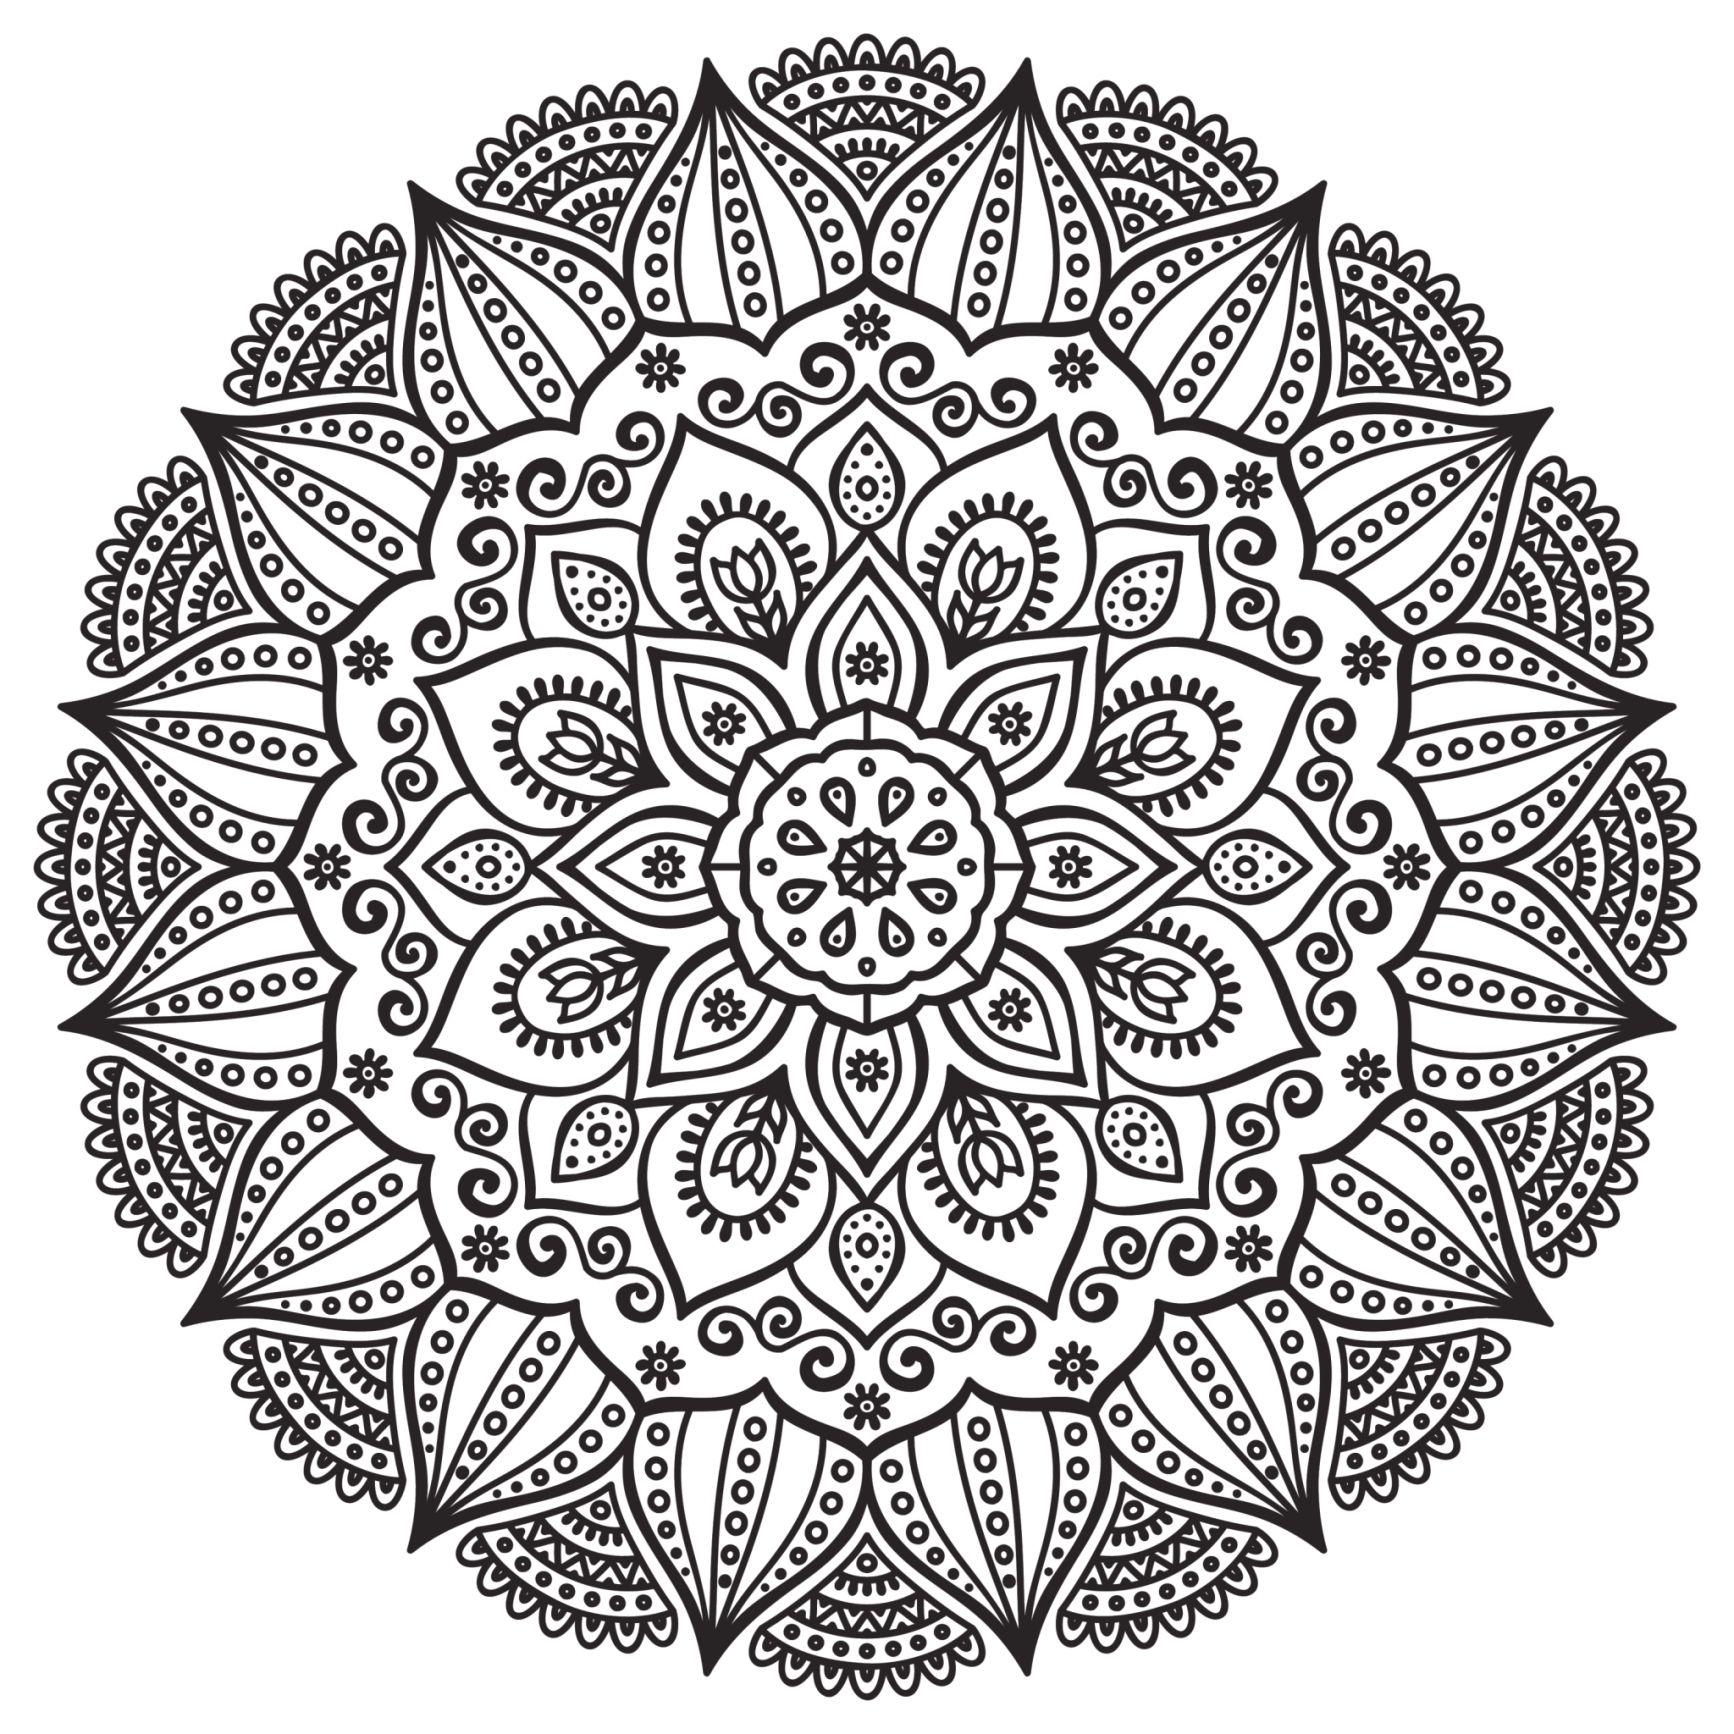 Mandalasparacoloreardificilesimprimirjpg (1734×1734